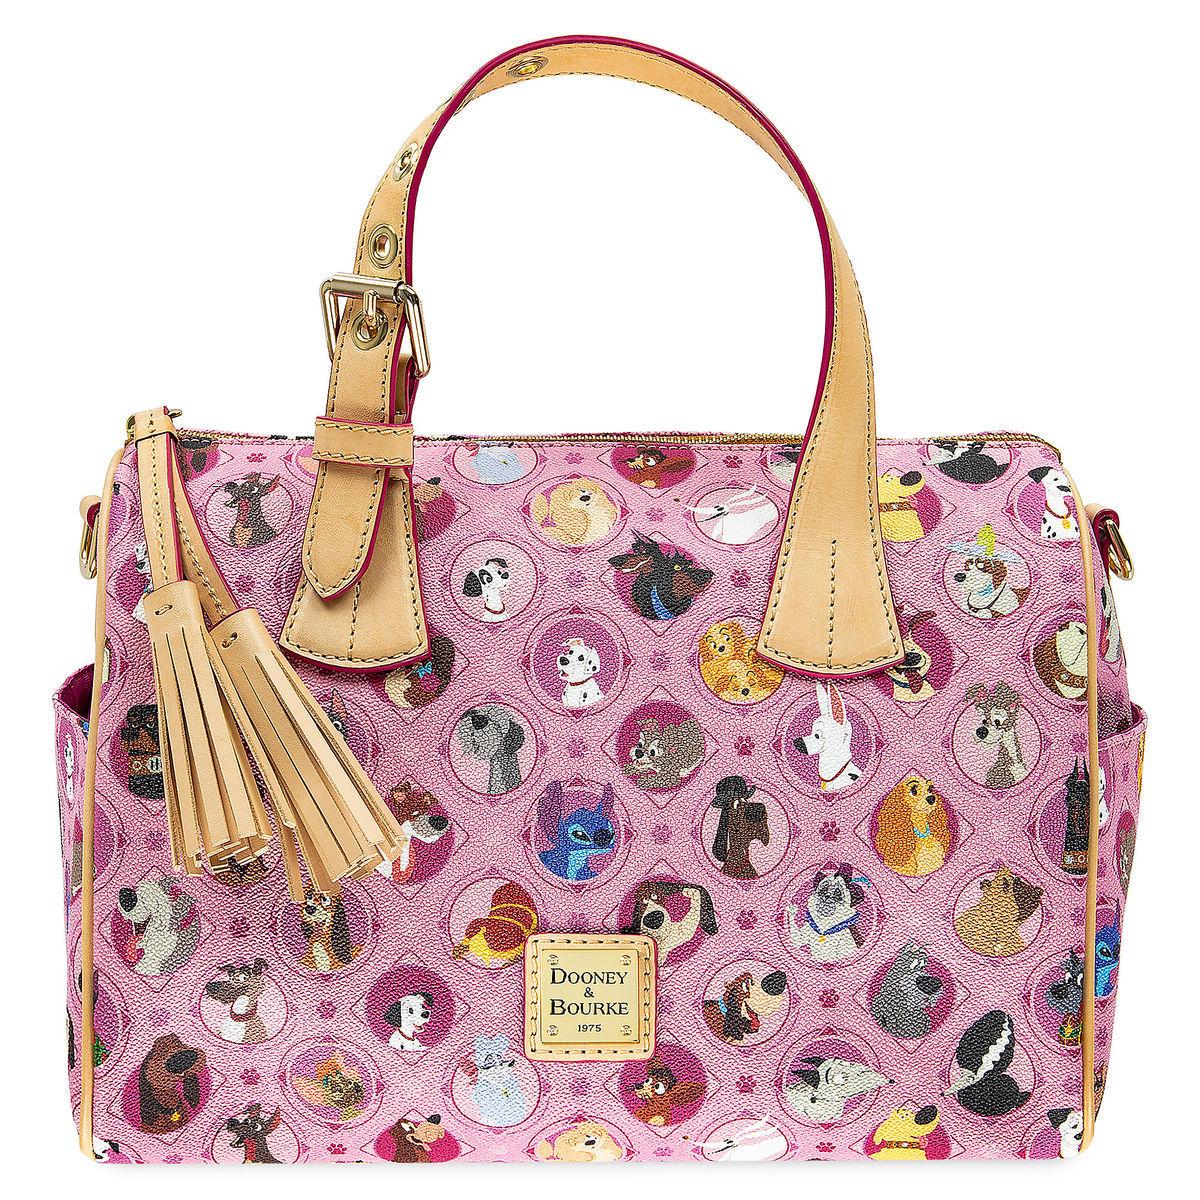 dafae9452e Disney Dooney   Bourke Bag - Disney Dogs - Satchel - Pink